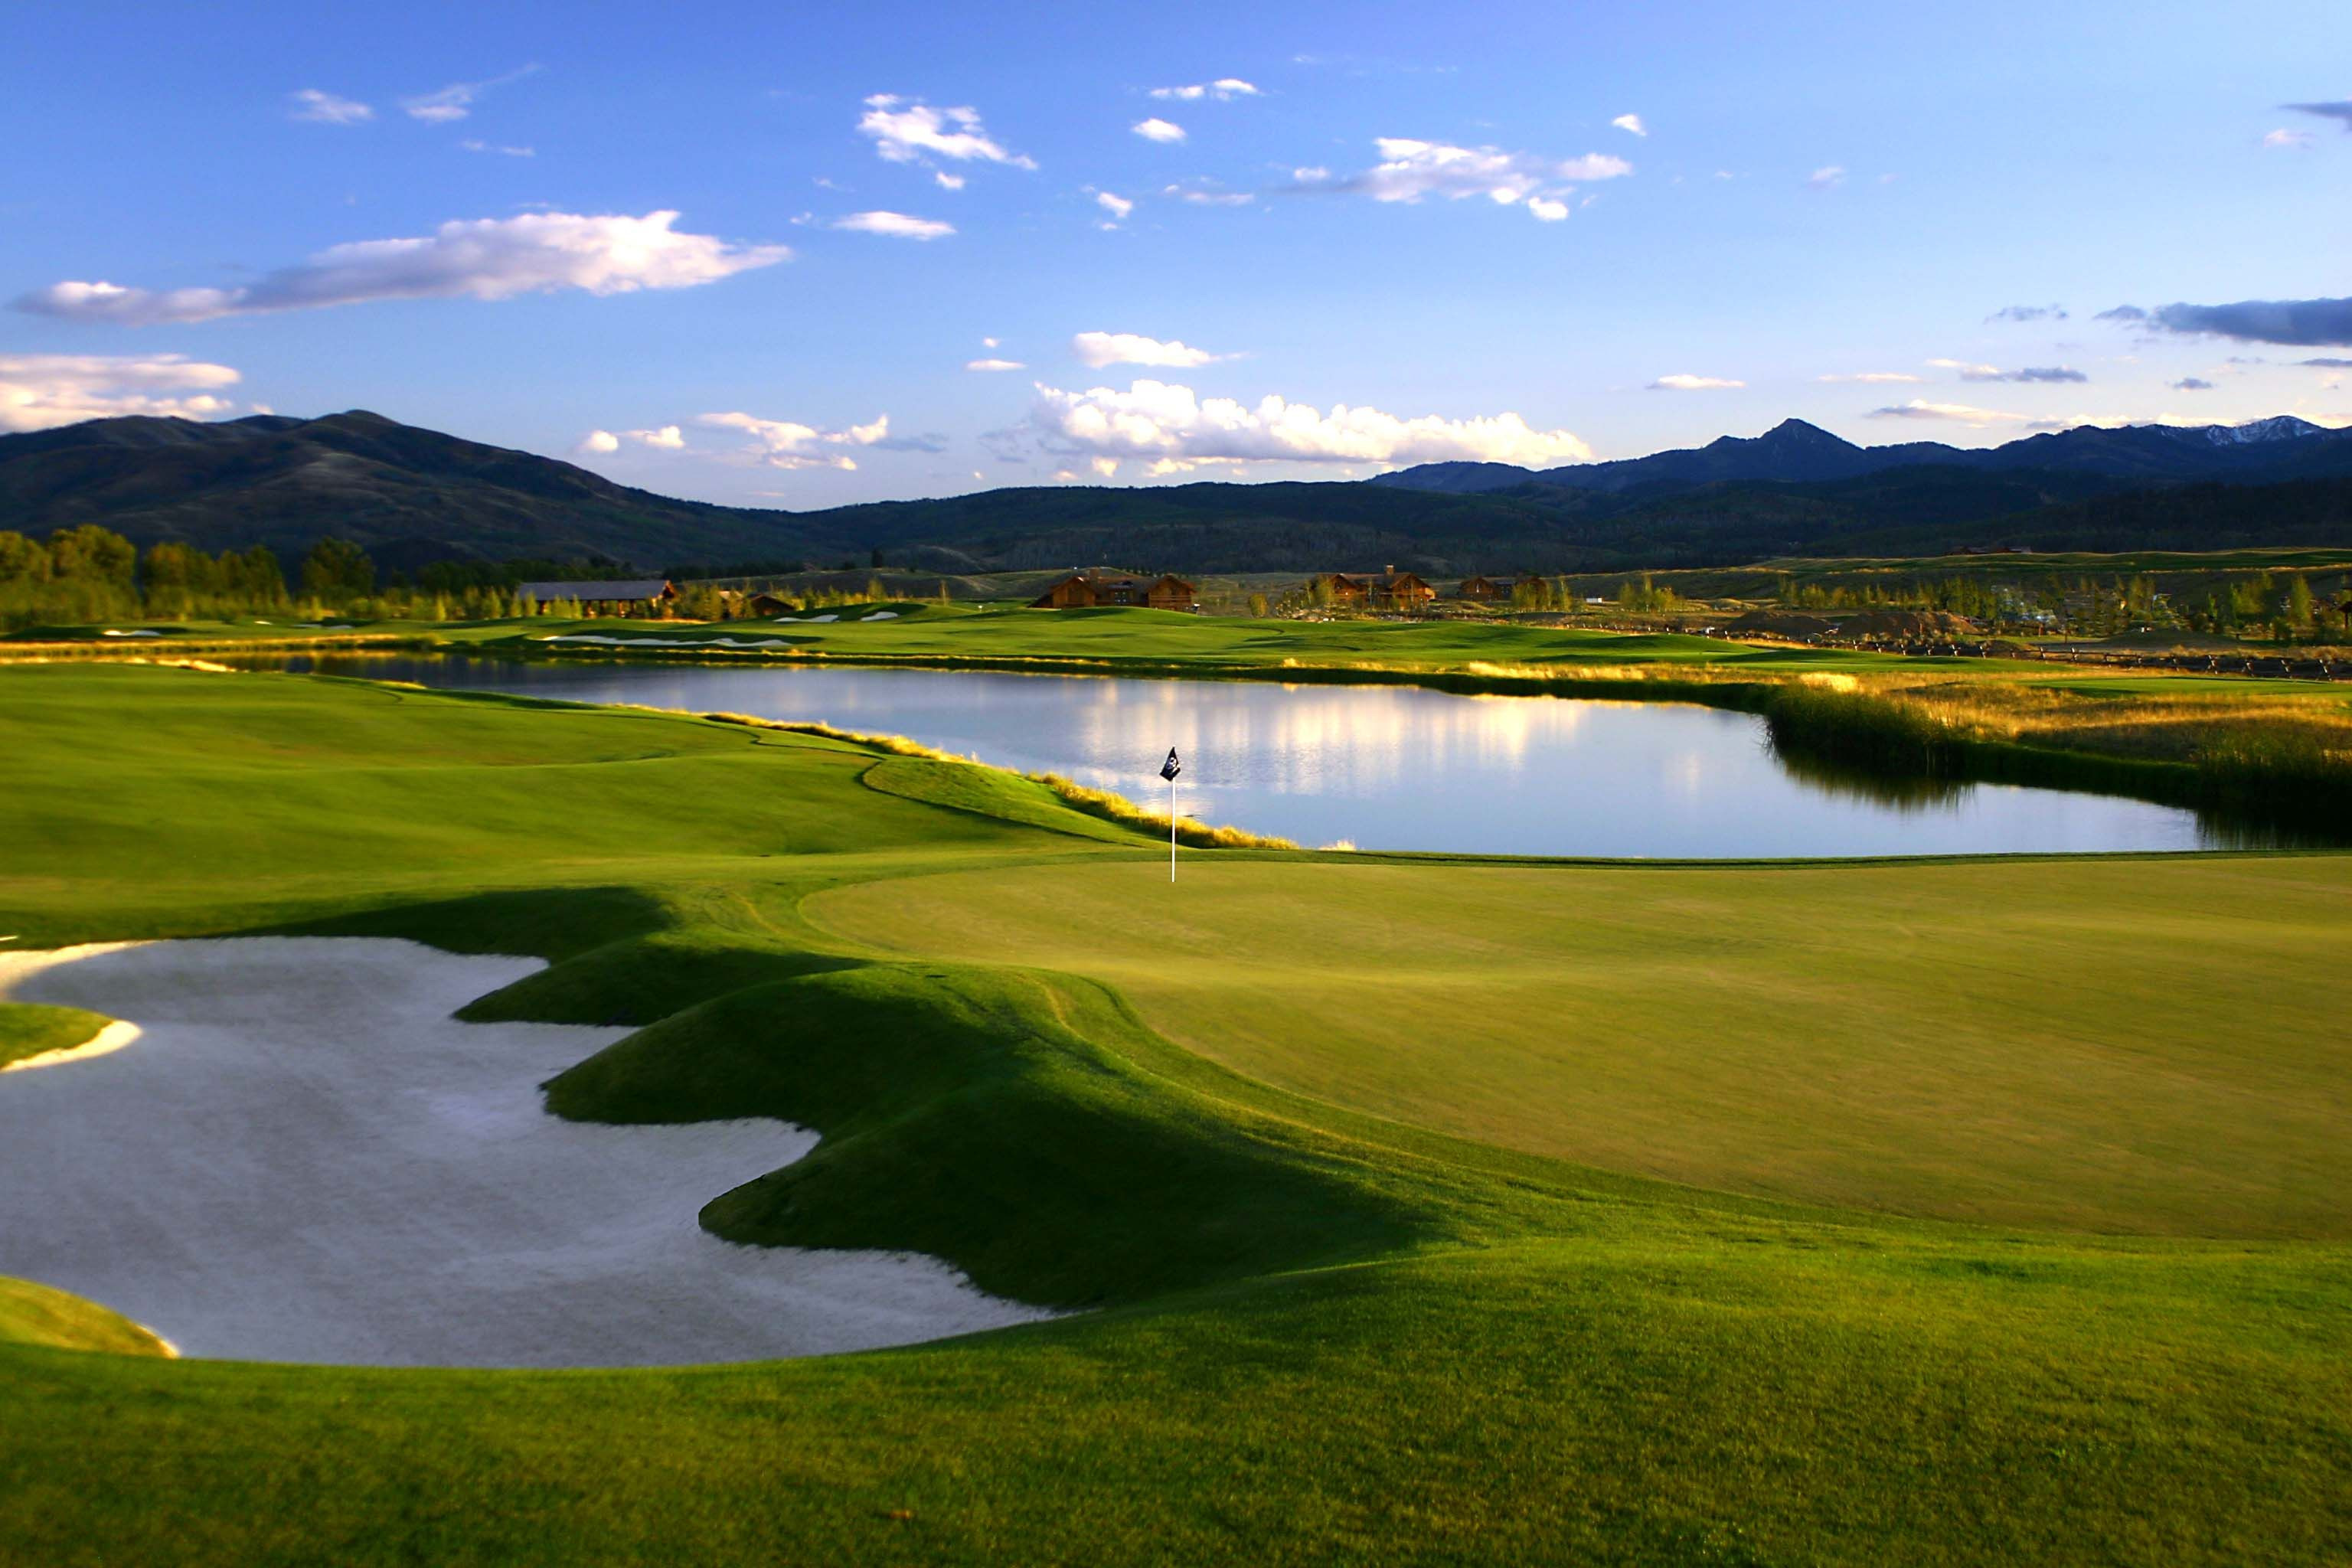 Green At Hole 11 3 Creek Ranch Golf Club Golf Courses Golf Golf Clubs